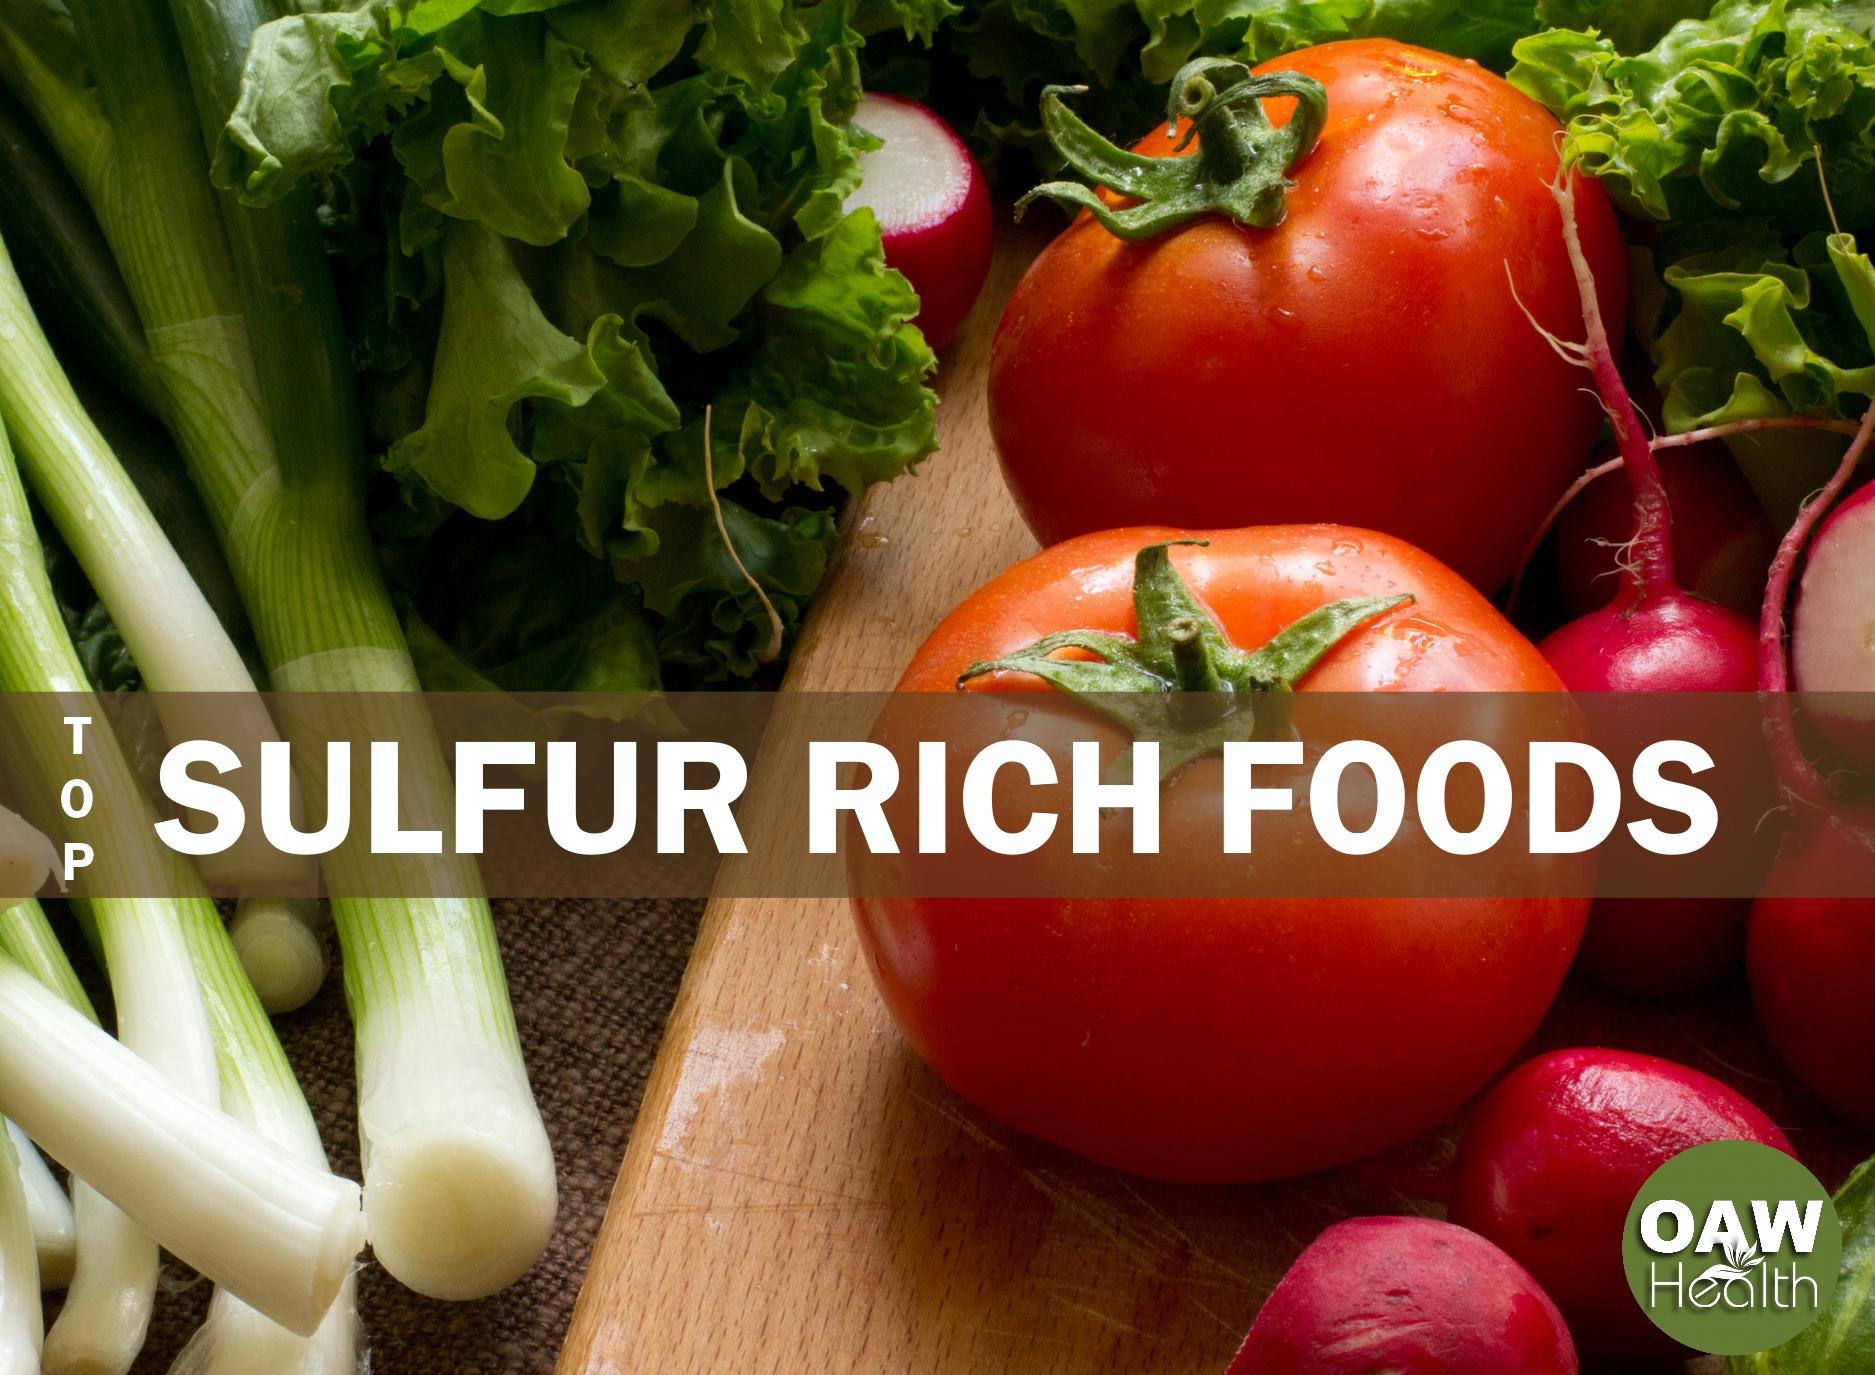 Top Sulfur Rich Foods